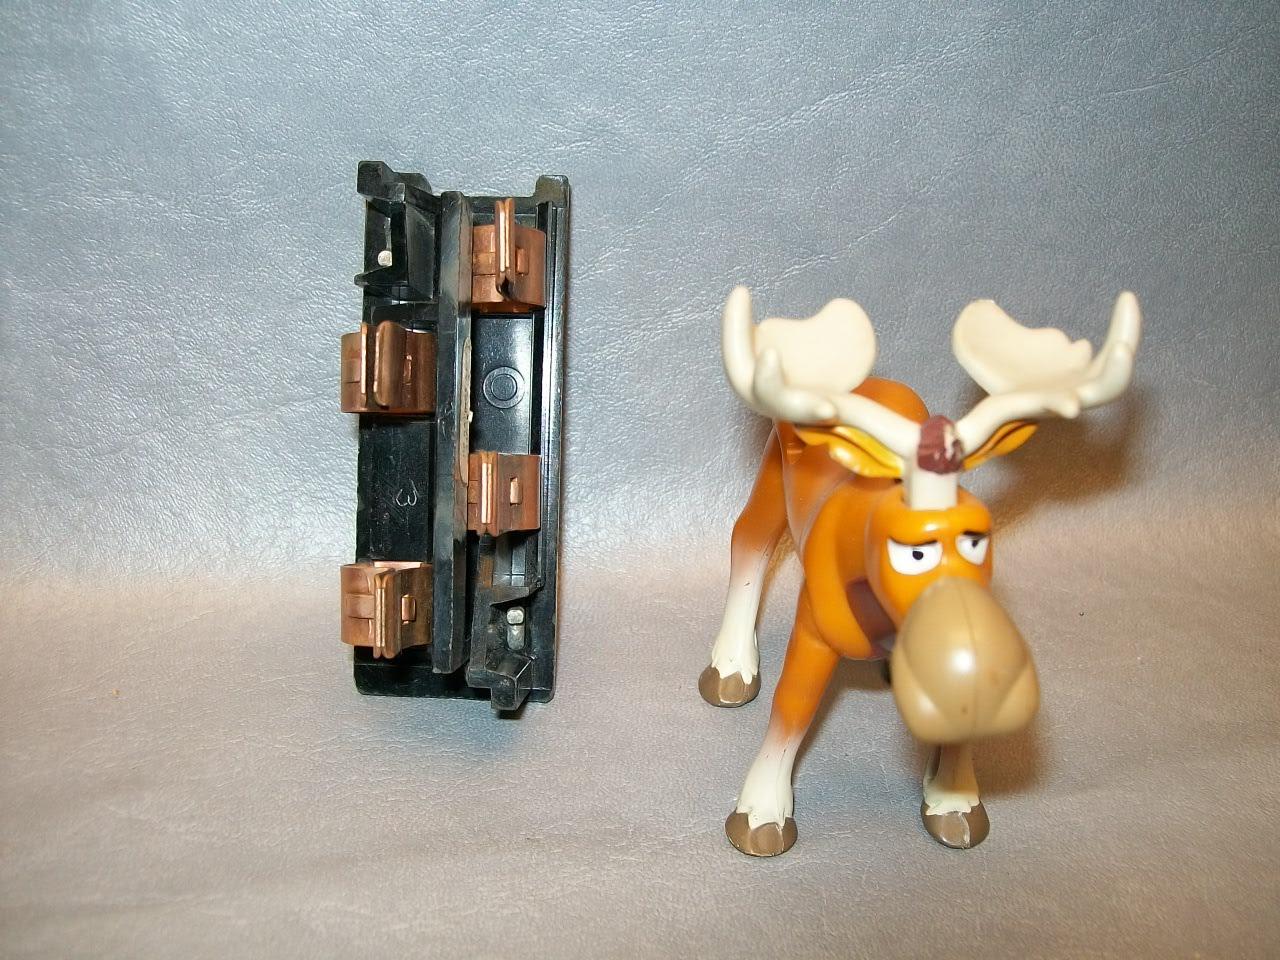 Chevy Cobalt Fuse Box 30 Amp